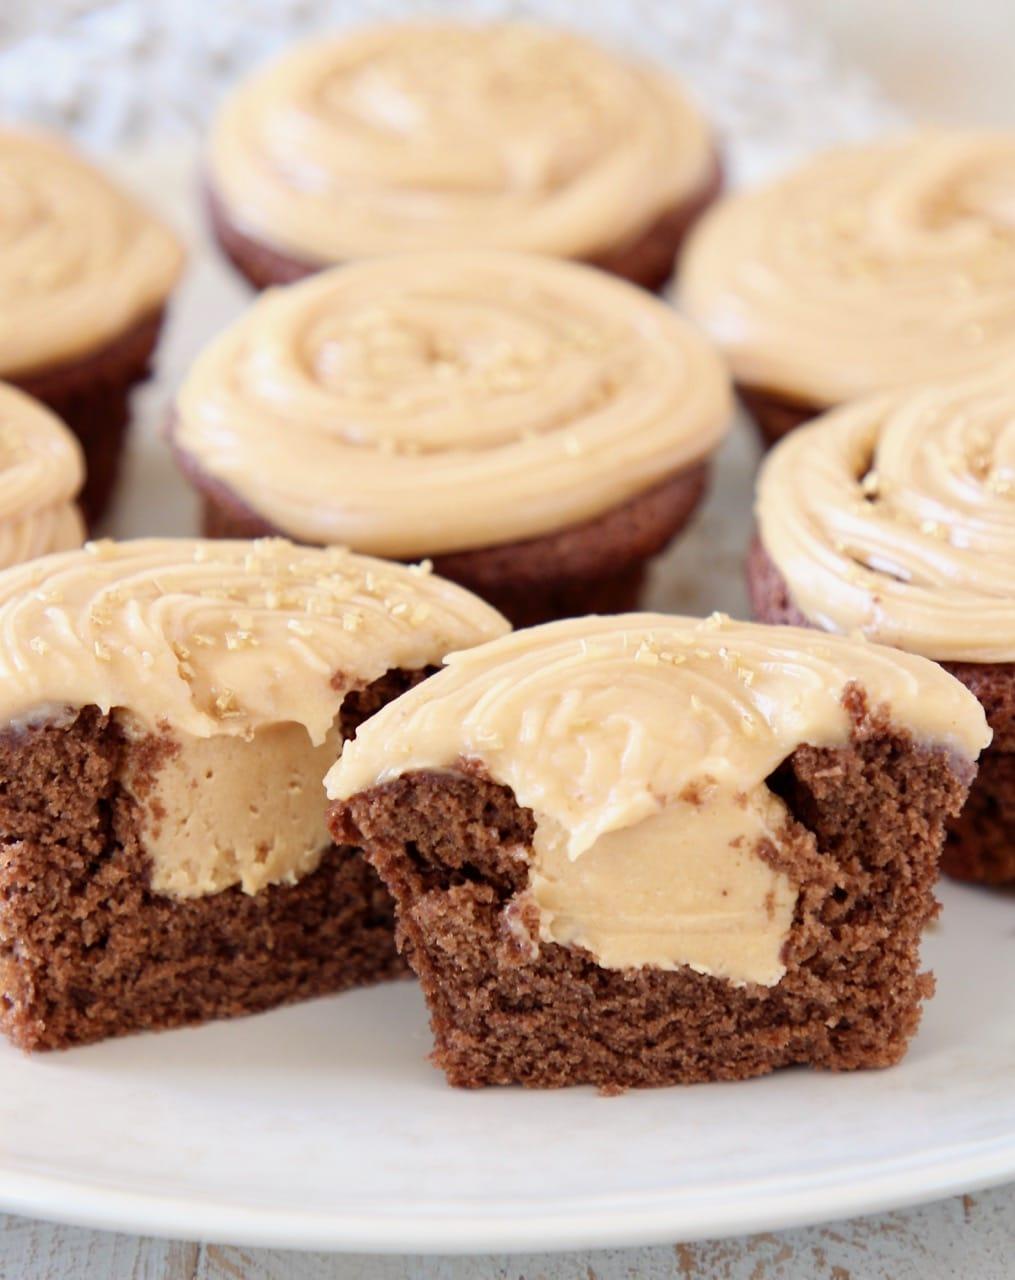 Peanut butter filled chocolate cupcake cut in half on plate